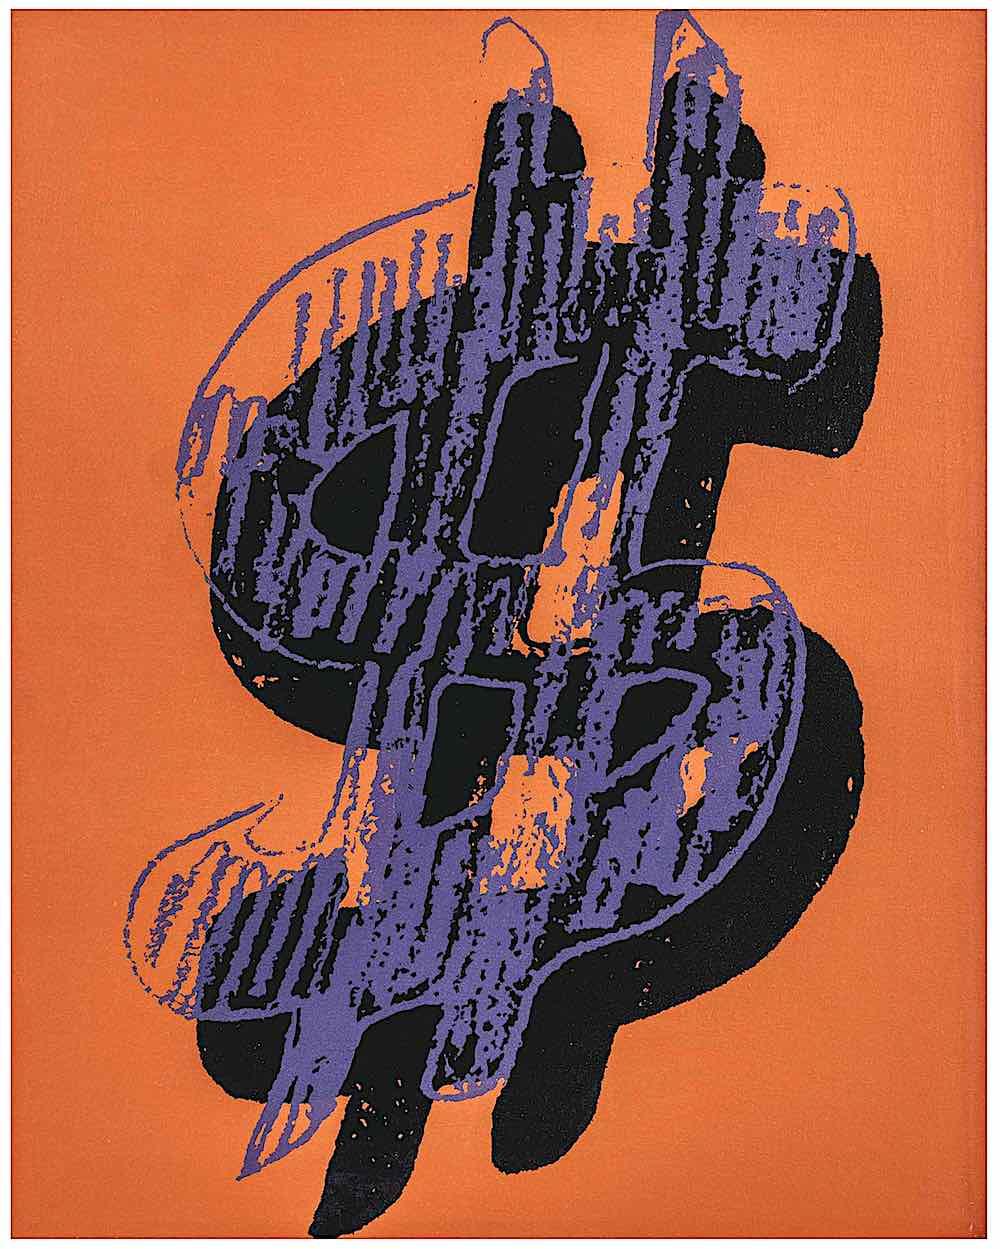 an Andy Warhol print of a dollar symbol in purple black and orange